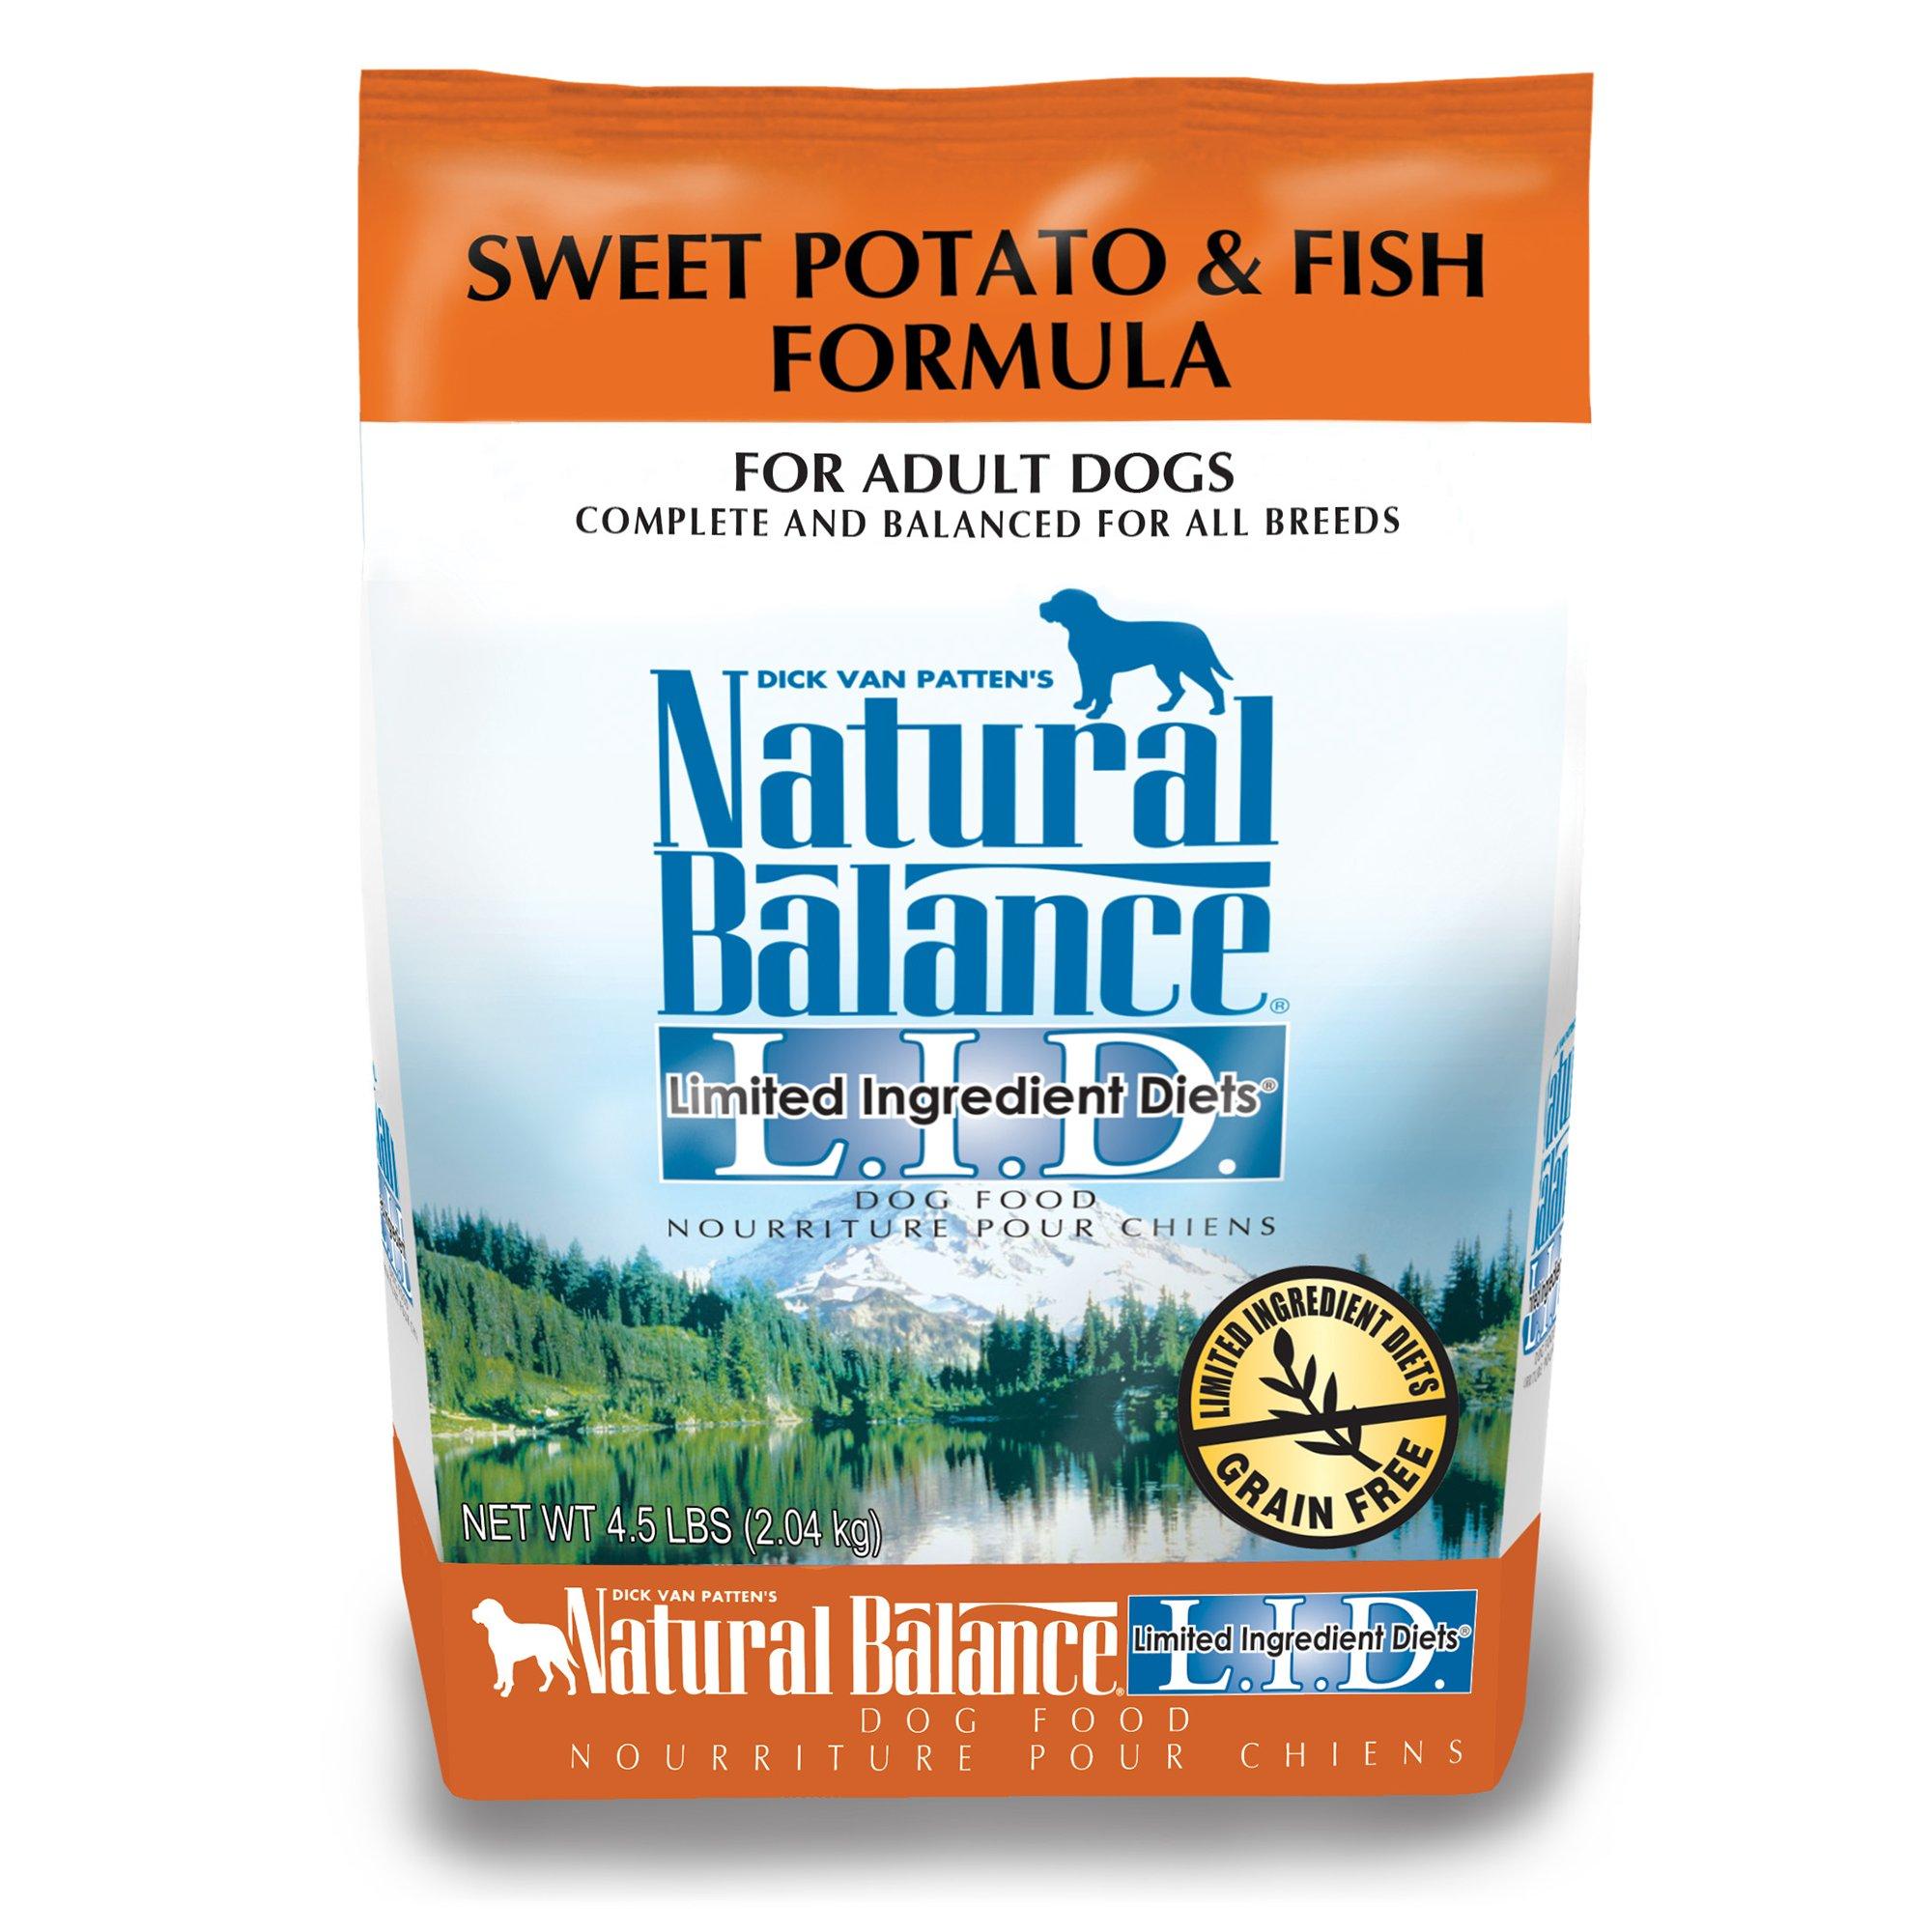 Natural Balance L.I.D. Limited Ingredient Diets Sweet Potato & Fish Dog Food